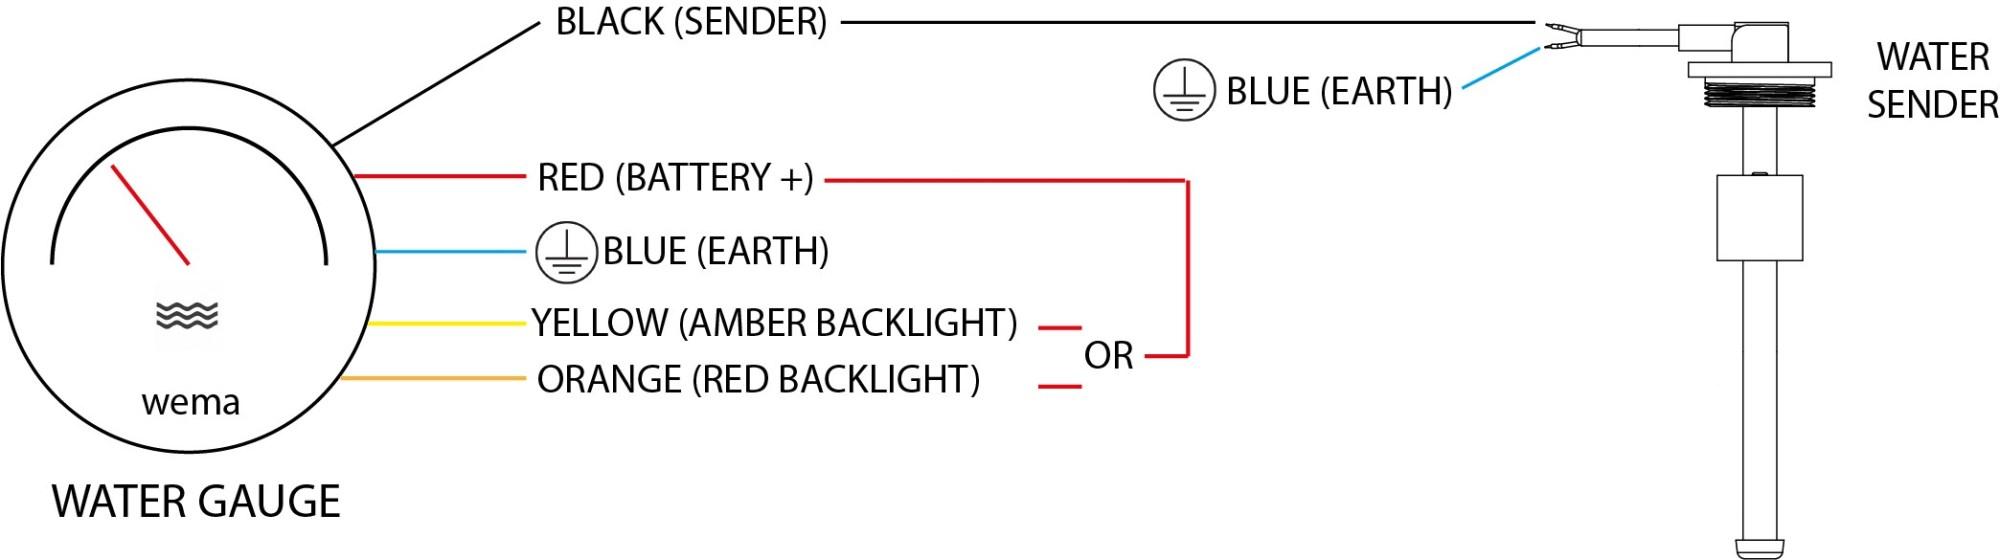 hight resolution of marine fuel gauge diagram wiring diagrams schematics and